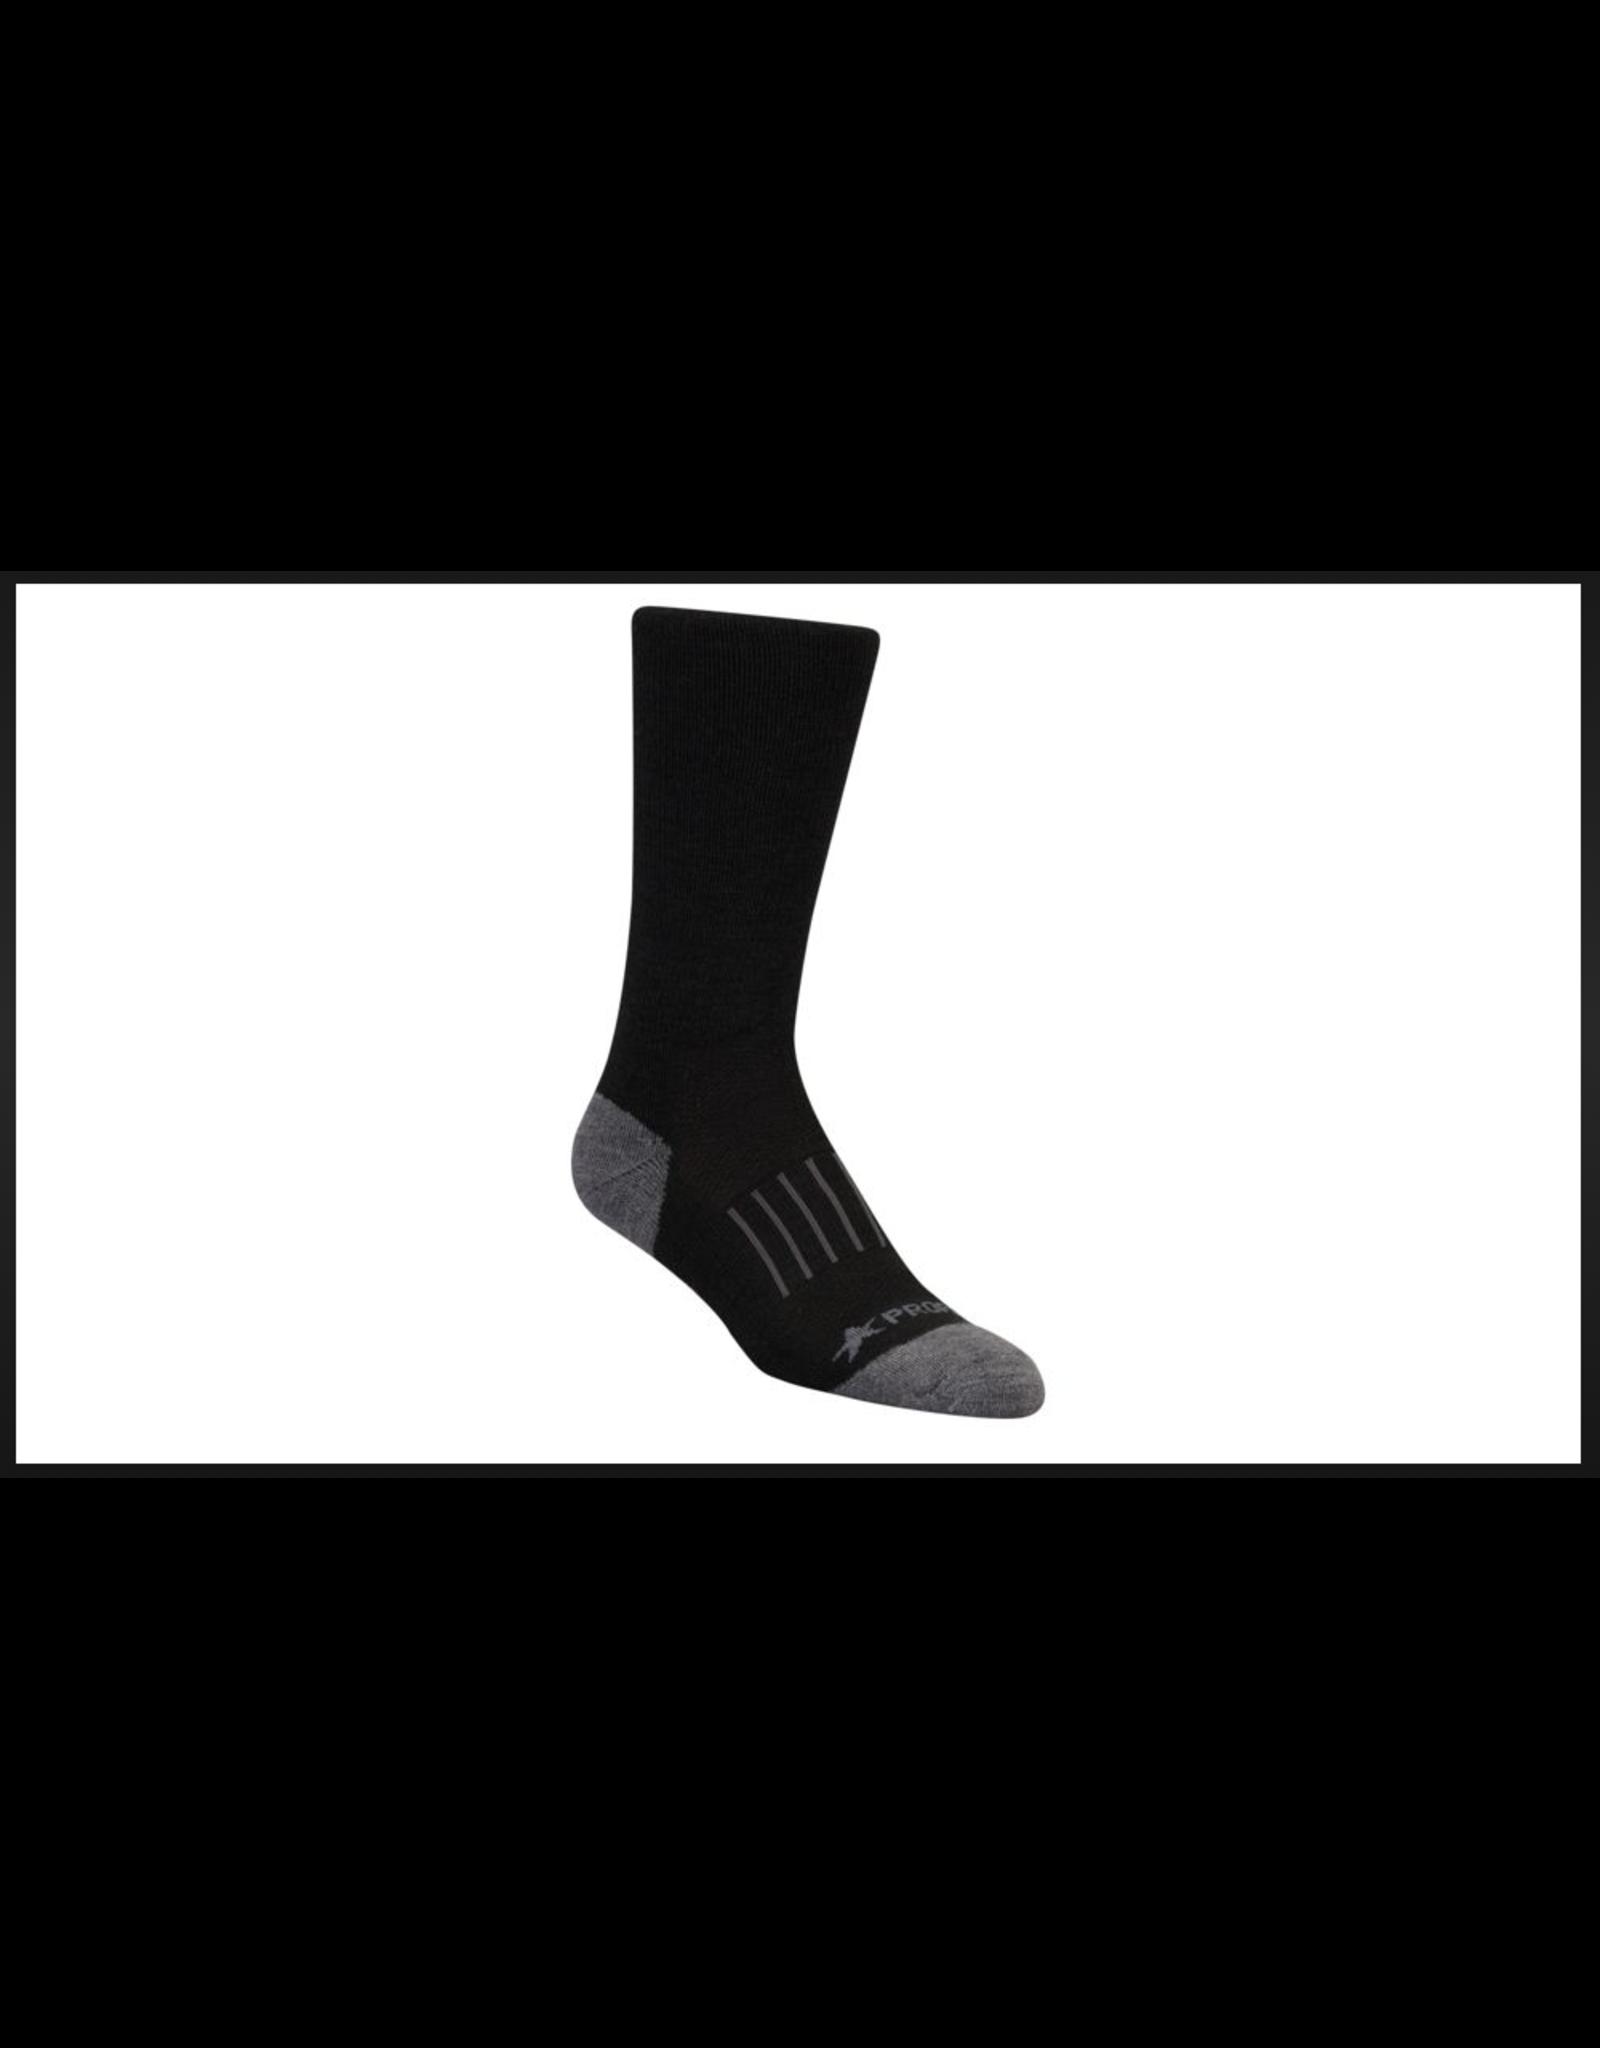 Propper Merino Wool Performance Boot Sock